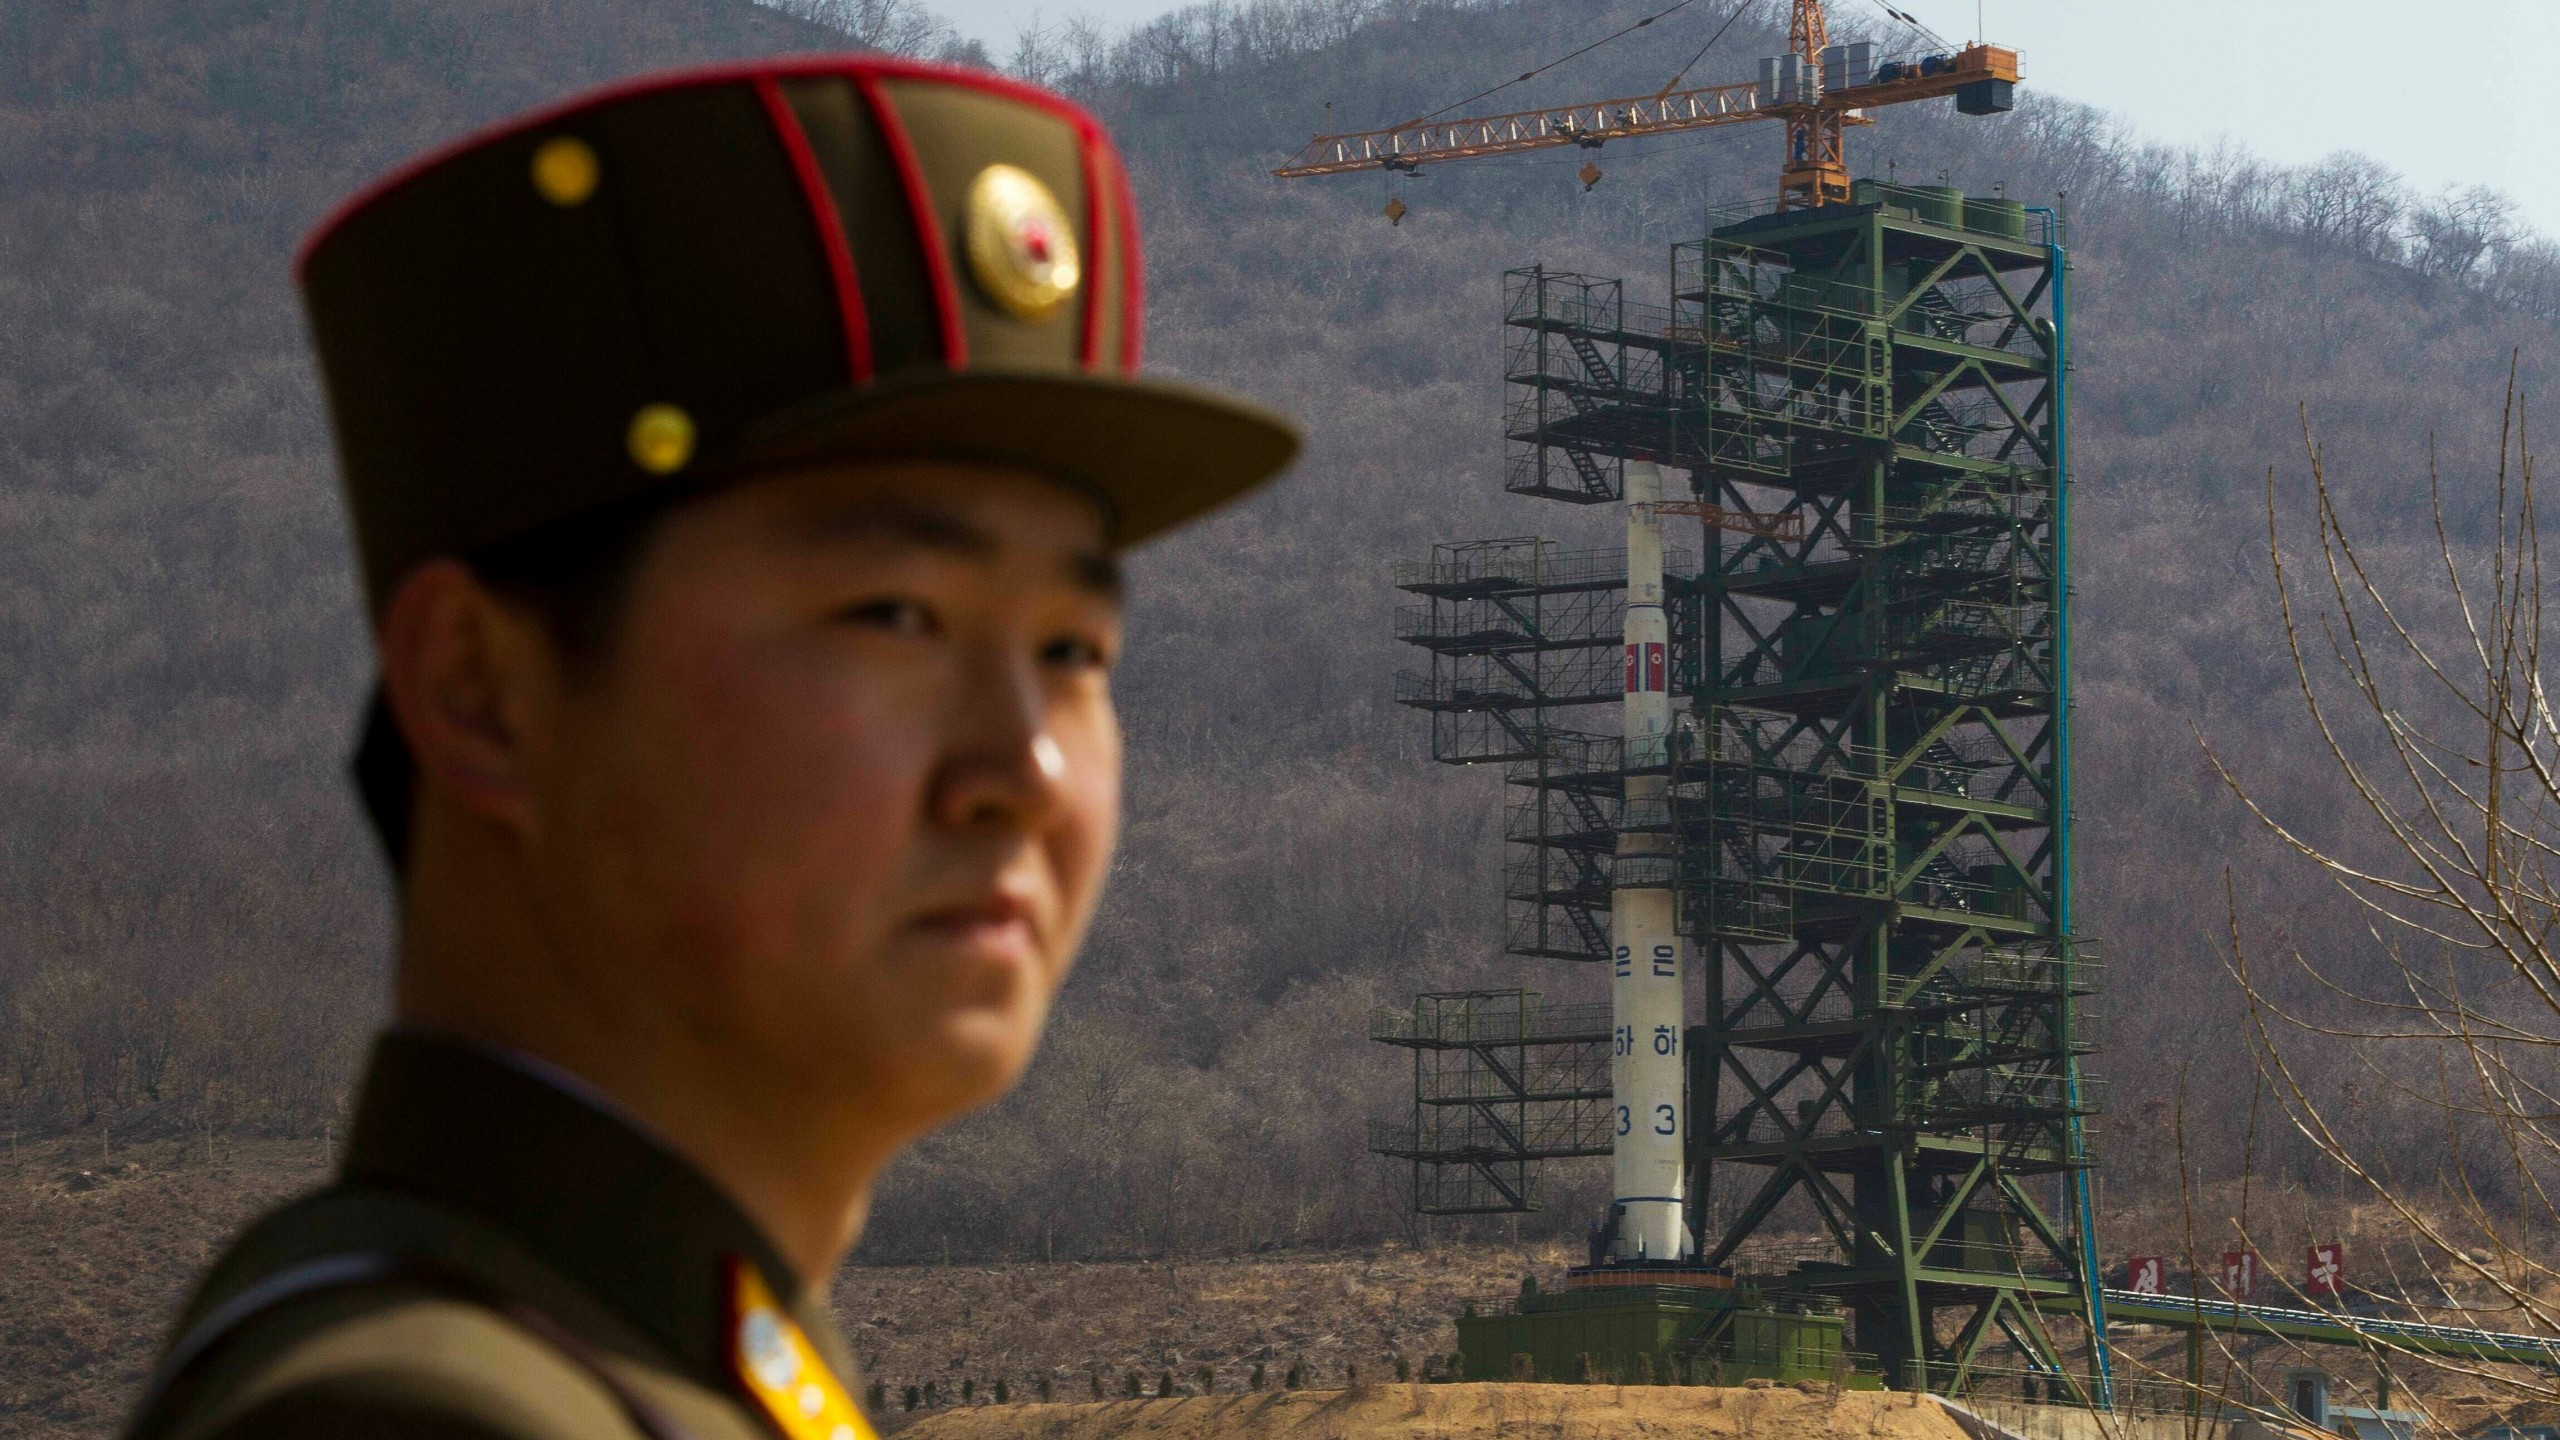 North_Korea_Koreas_Diplomacy_57780-159532.jpg06125937